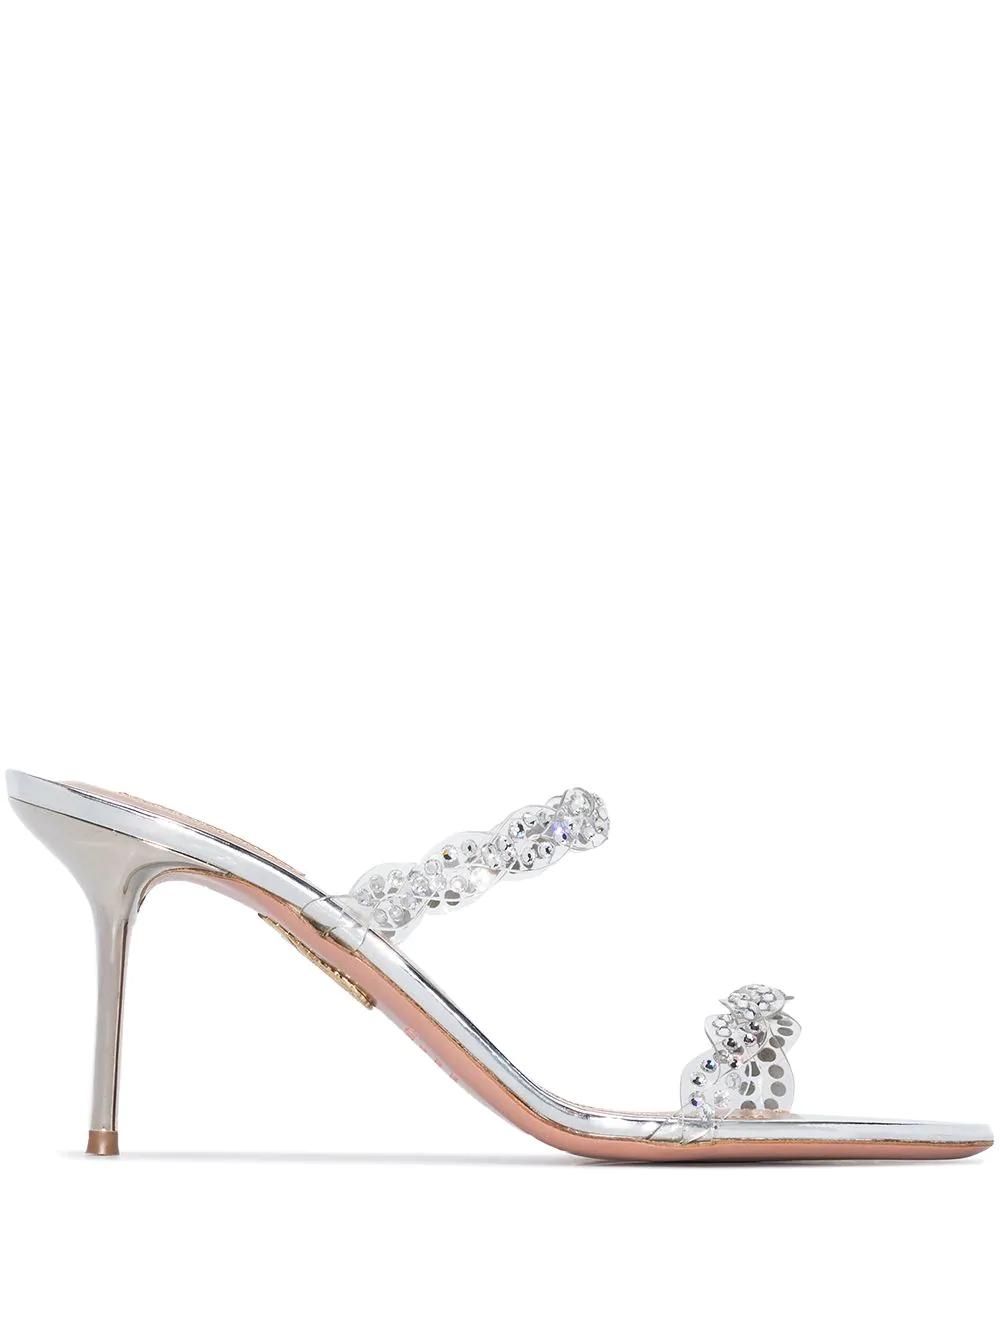 Aquazzura Heaven 75mm Crystal-embellished Sandals 2073лв